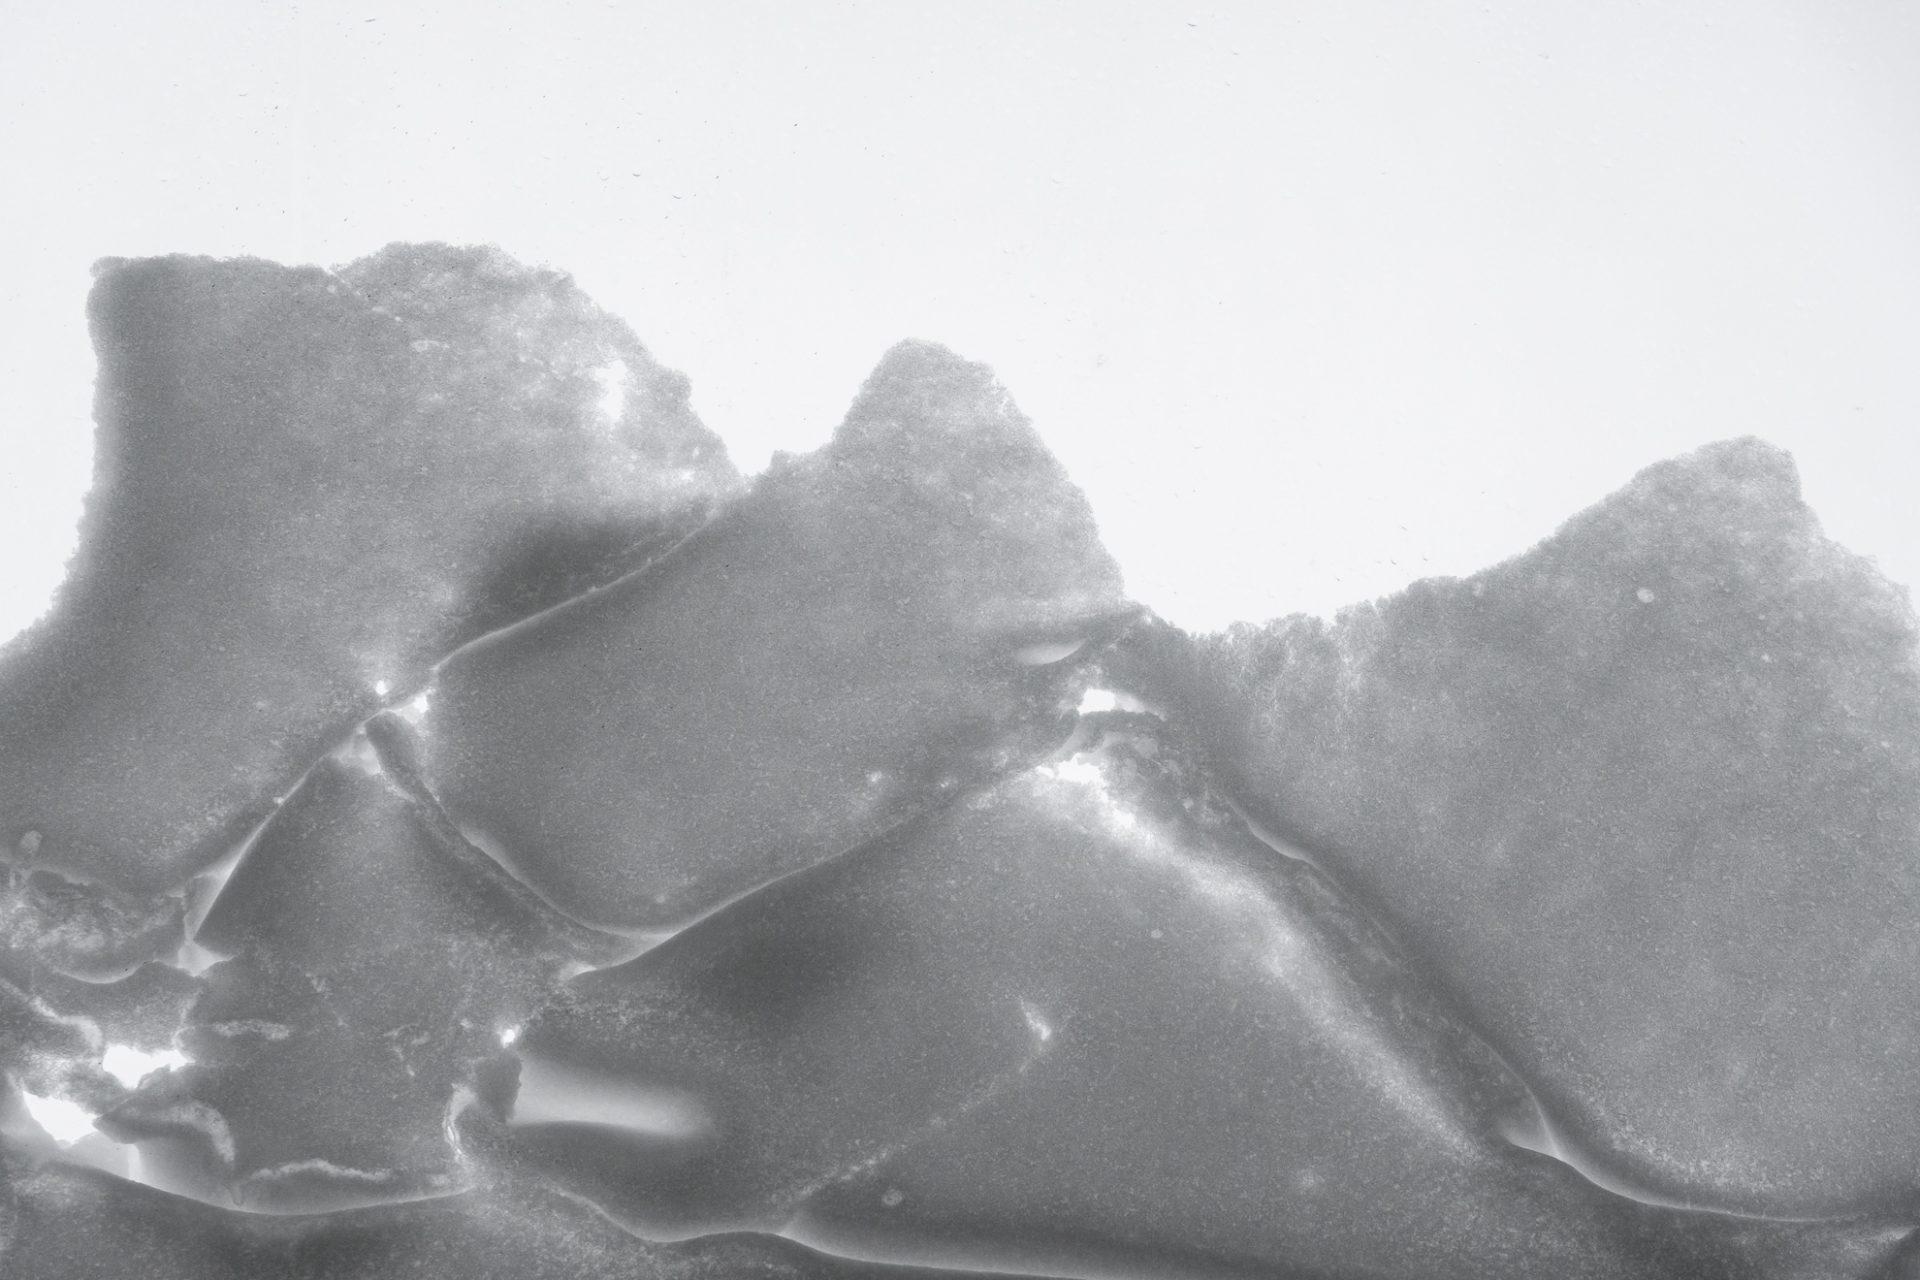 Fensterbild II • Lambda-Print auf FUJIFILM Crystal Archive DPII, 60 x 40 cm • Auflage: 5 + 2 Artist's Proof